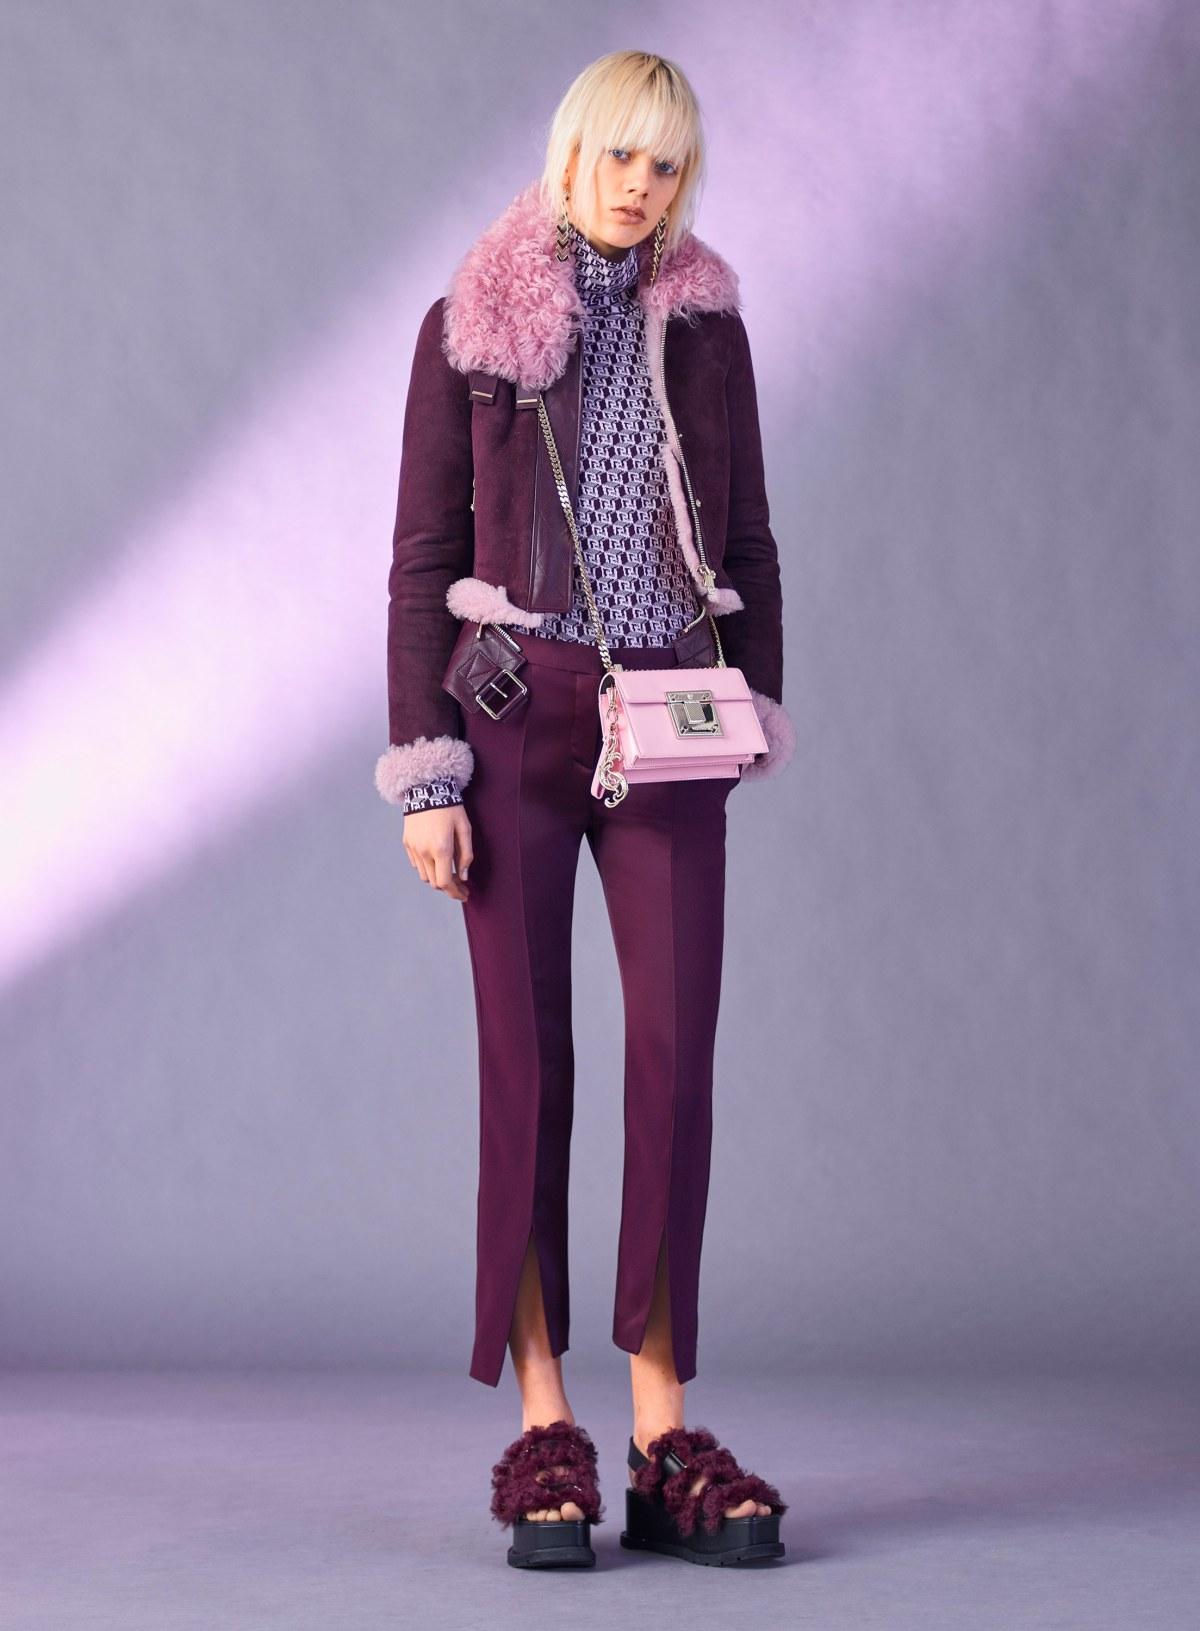 versace-pre-fall-2017-fashion-show-the-impression-16